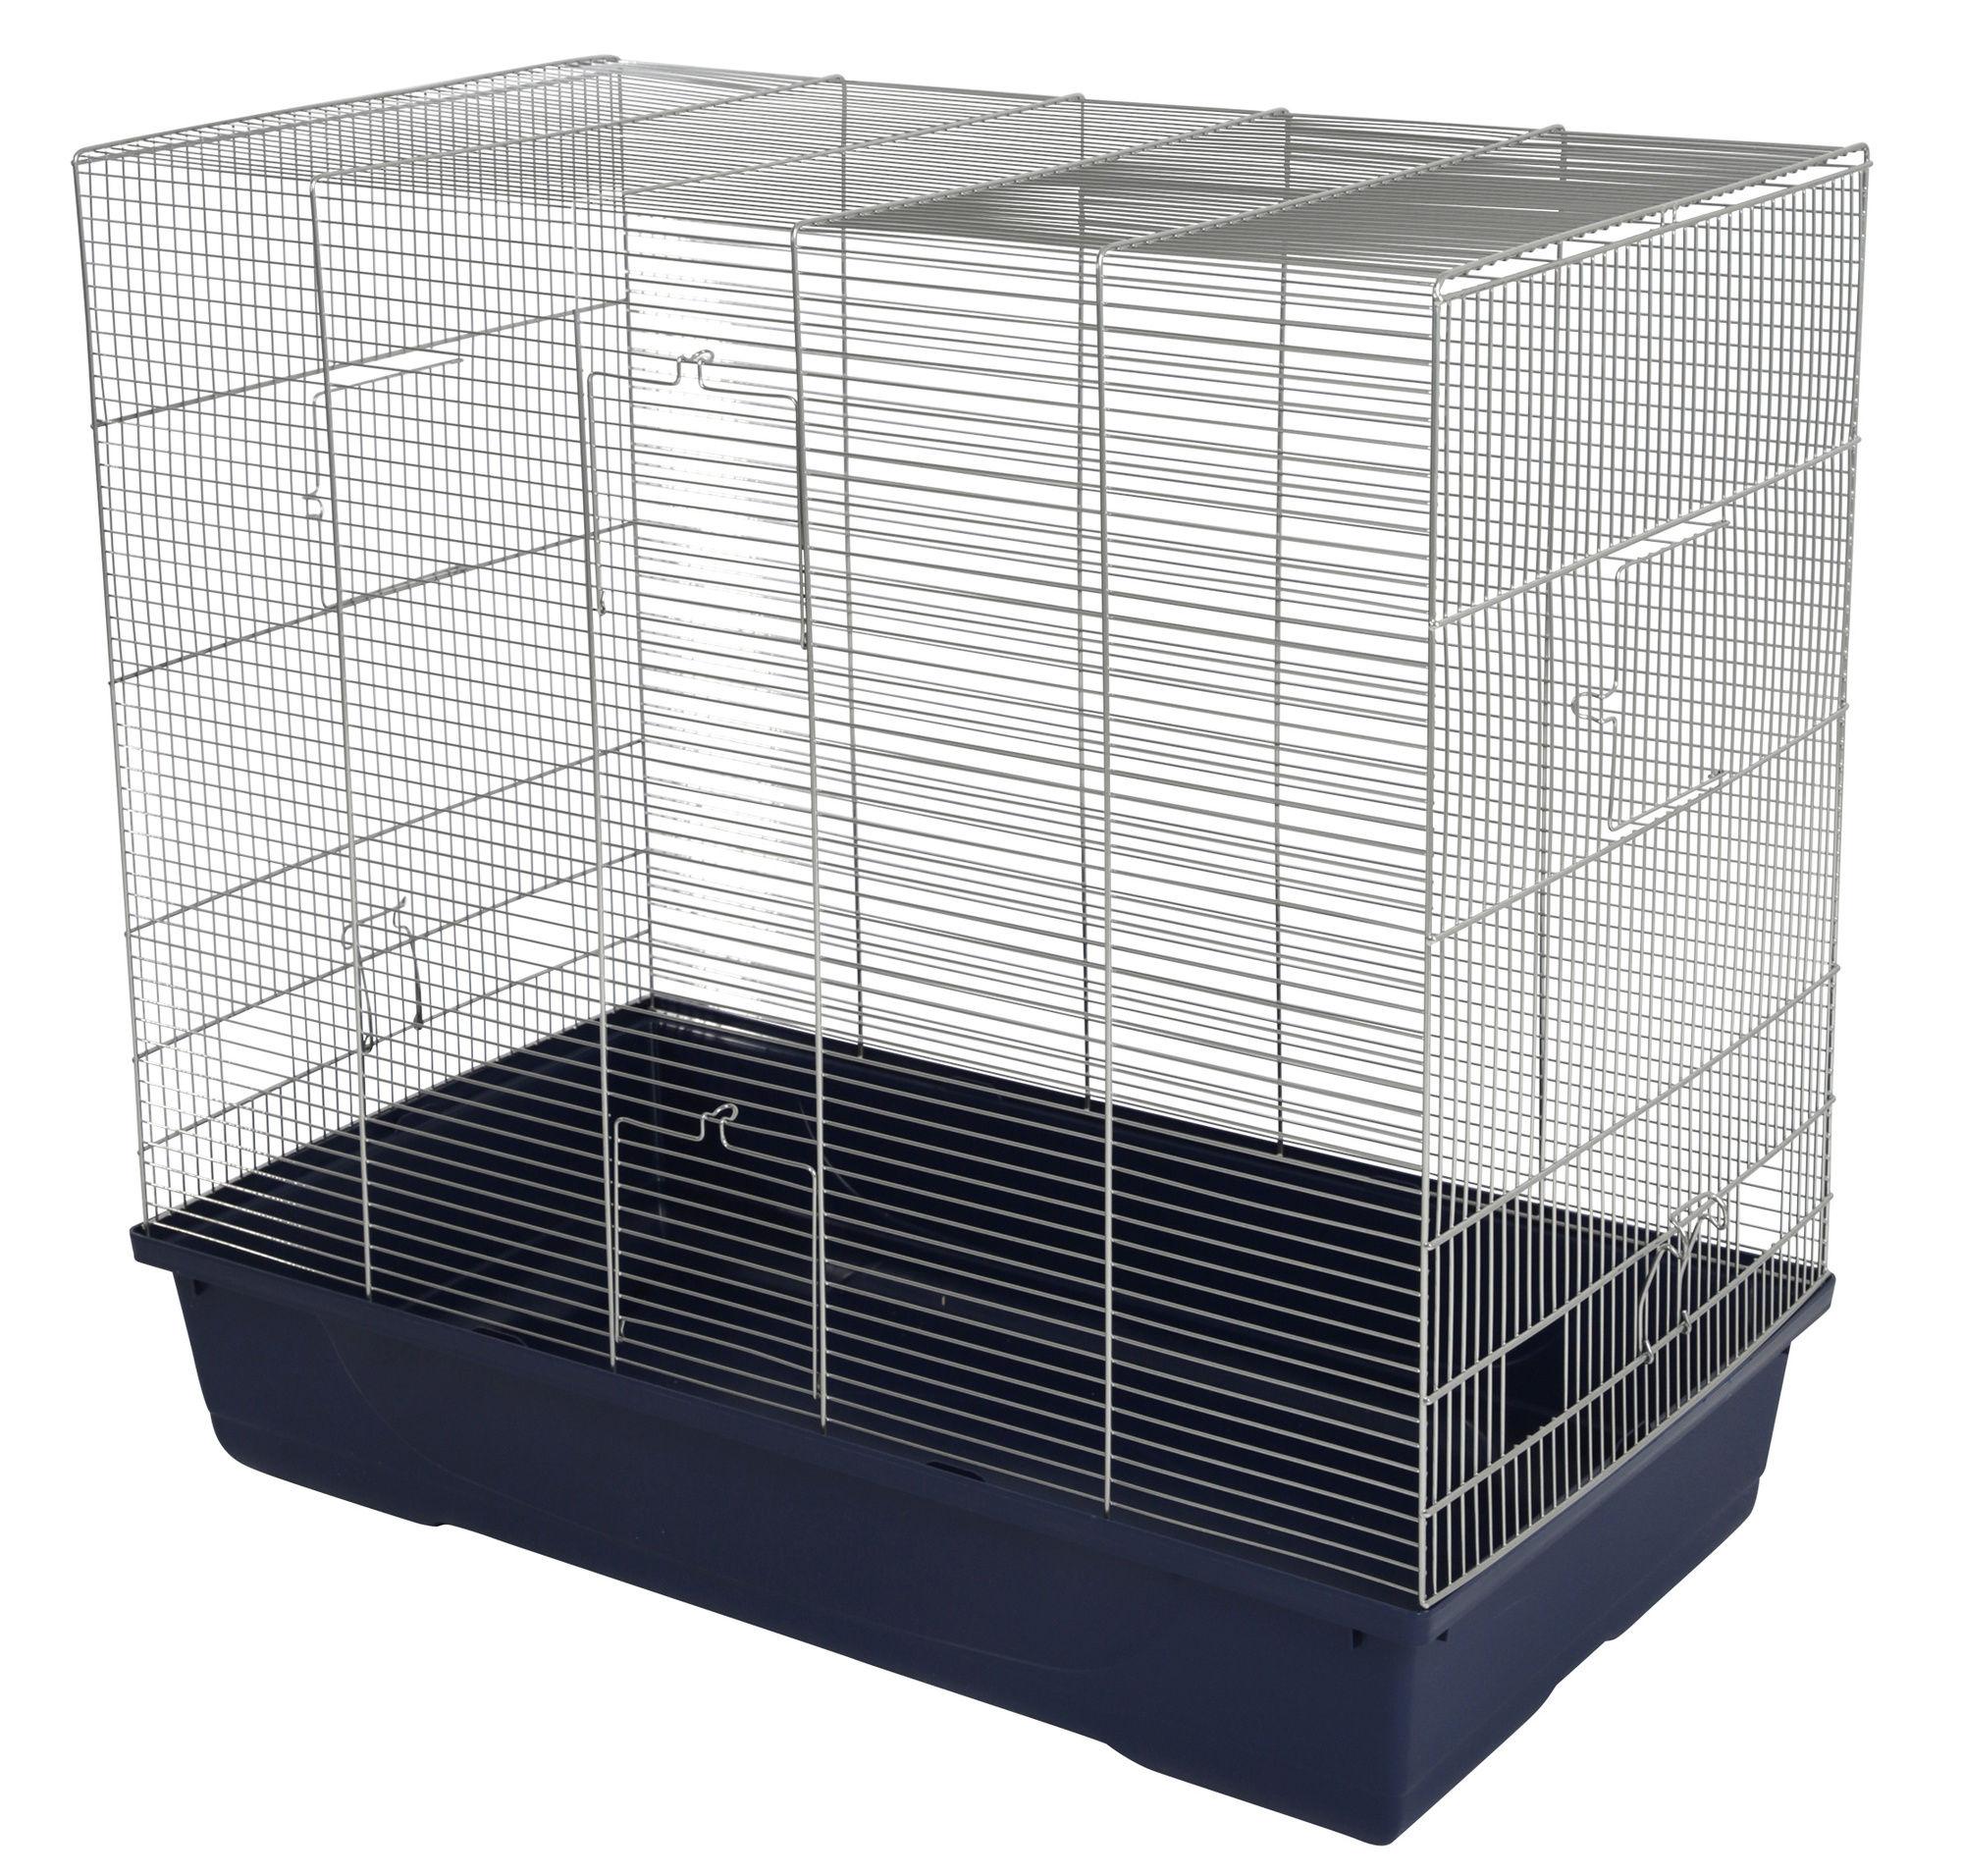 Vogelkäfig ROSE, 80x45x75cm